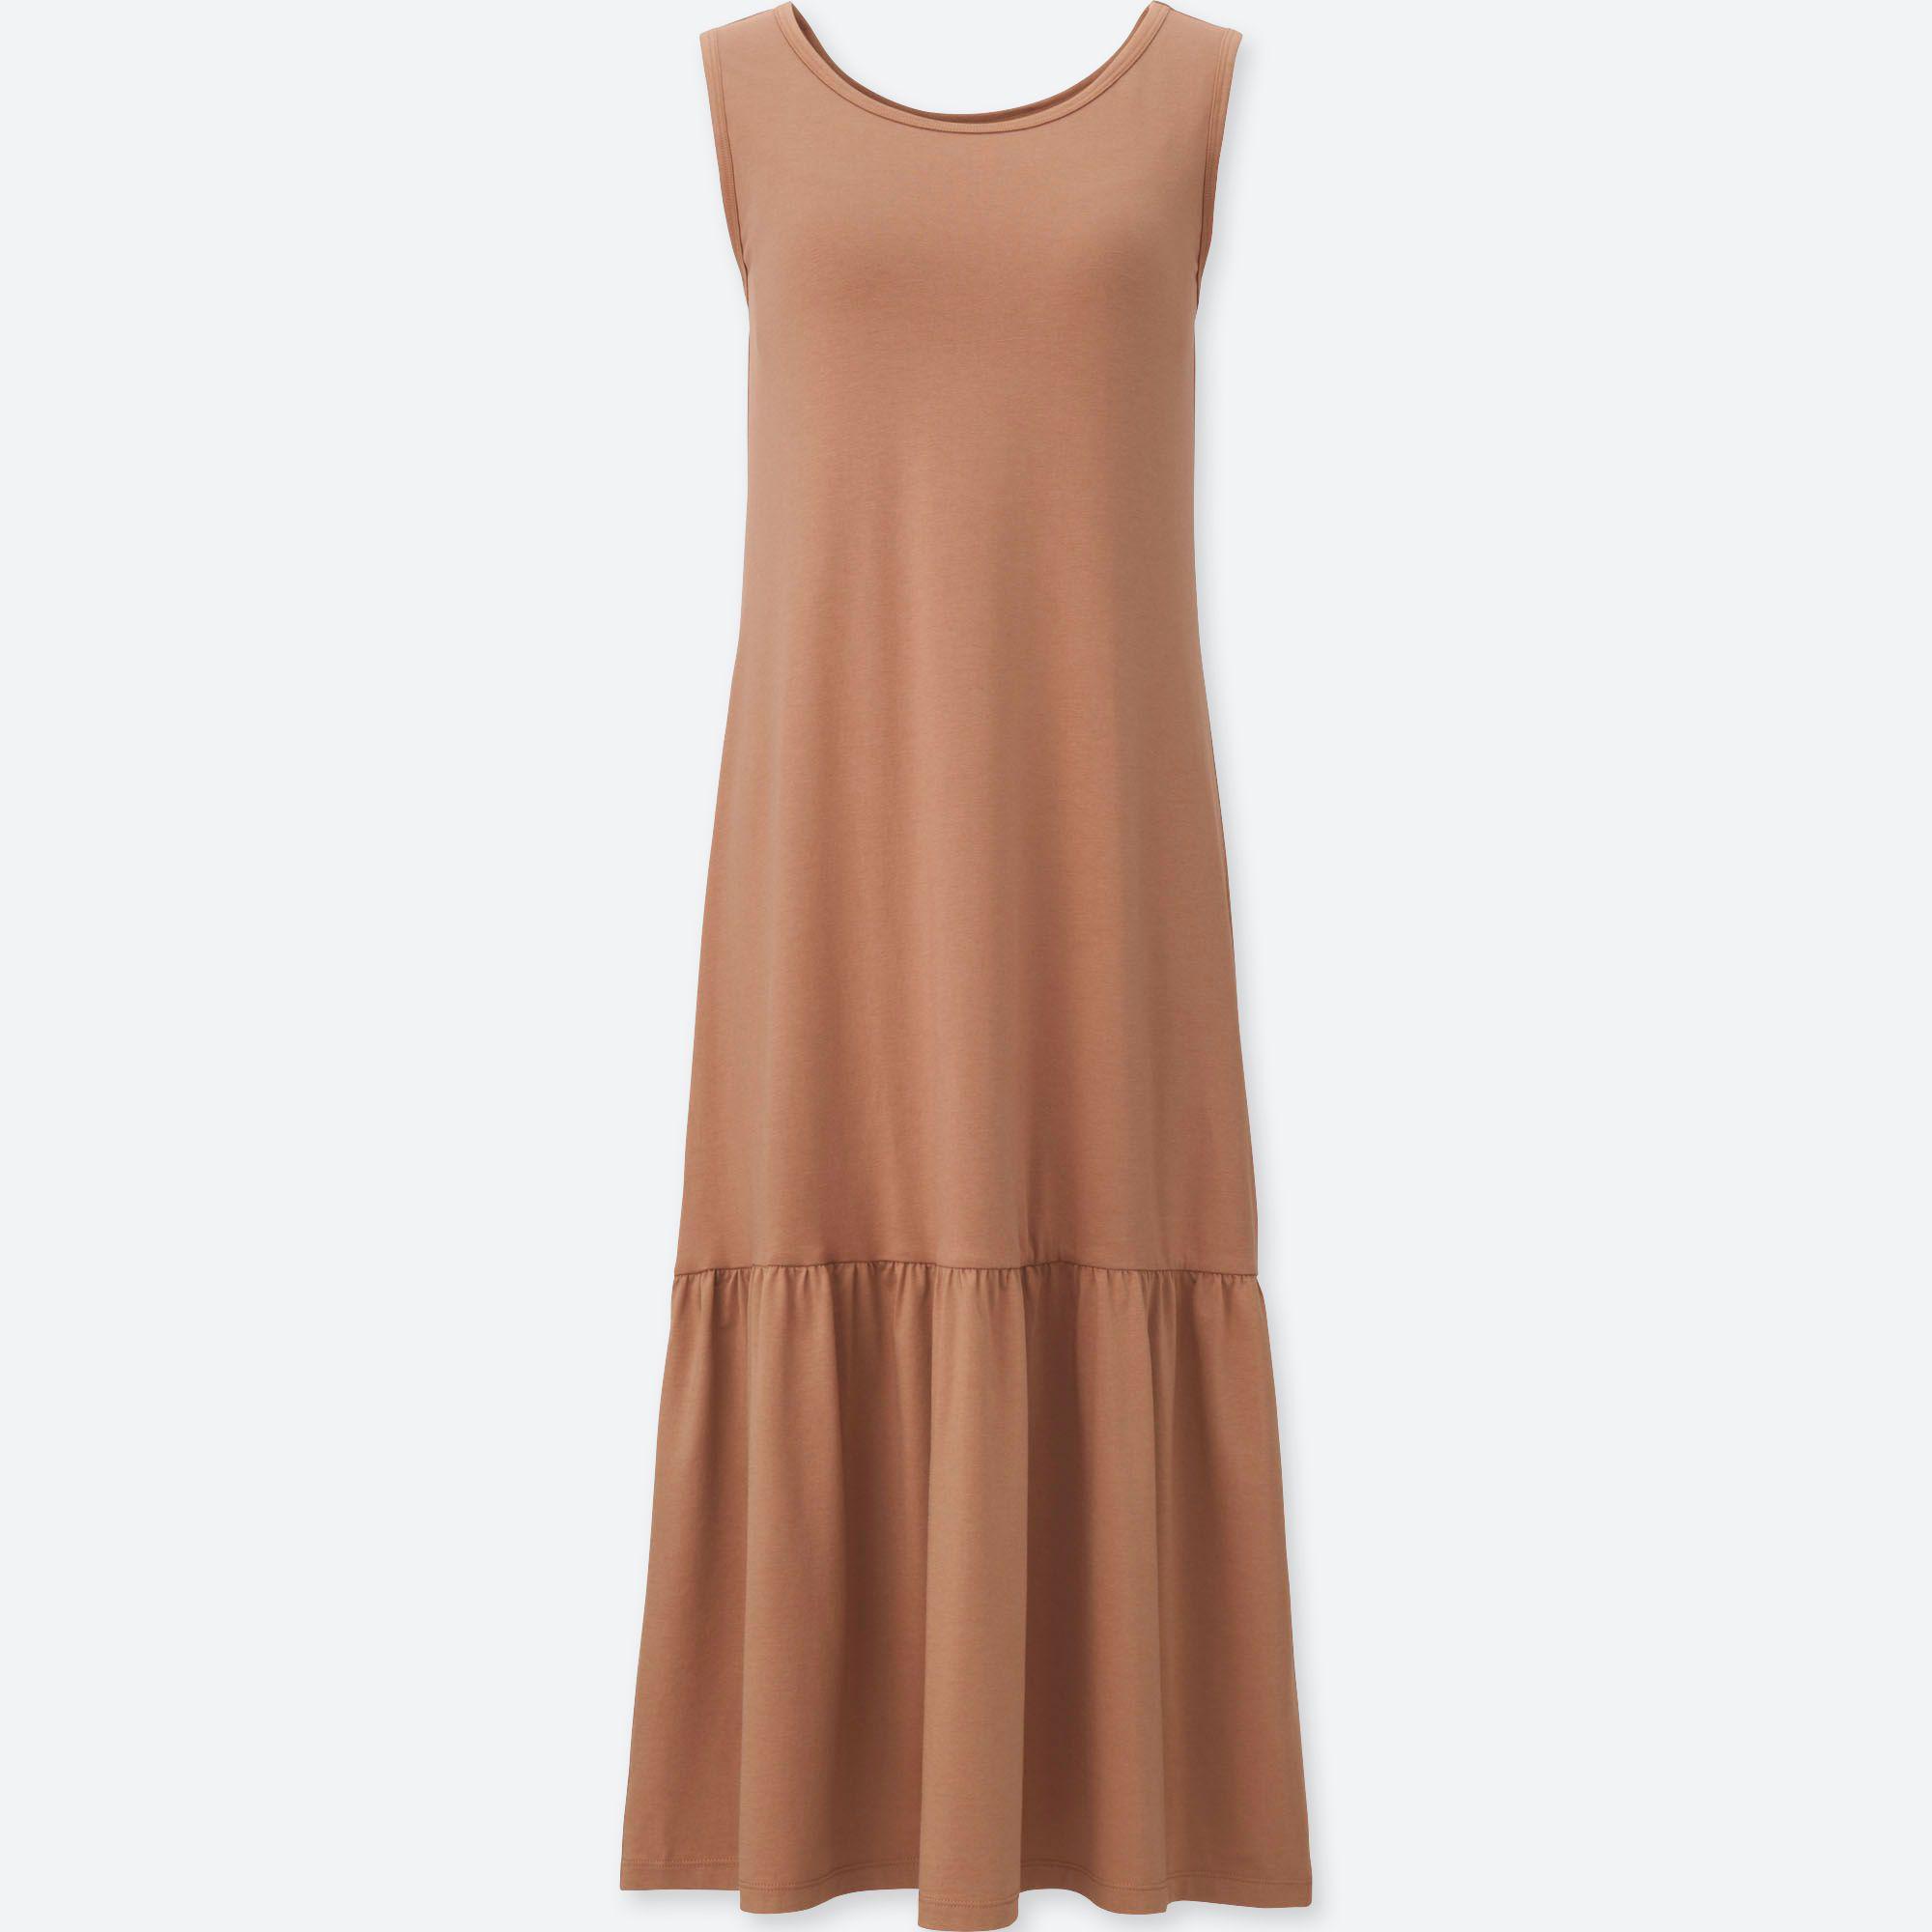 7c374d030a Uniqlo Flared Sleeveless Bra Dress in Orange - Lyst